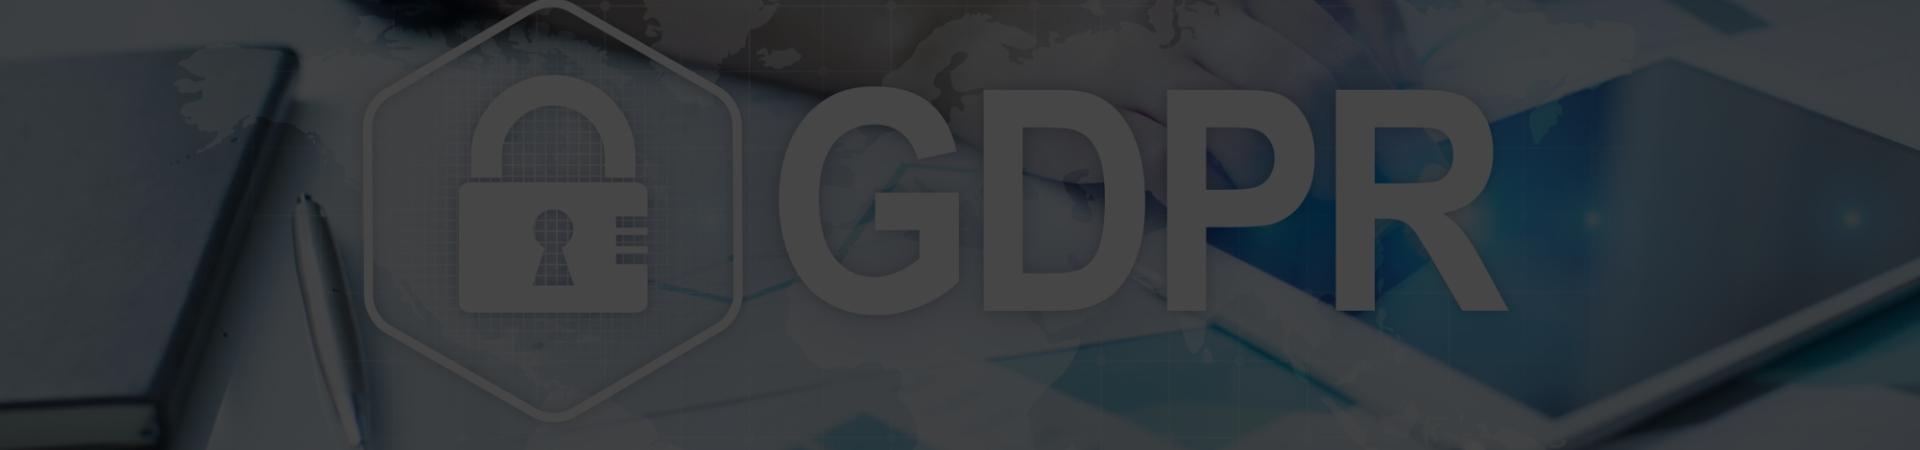 GDPR top banner